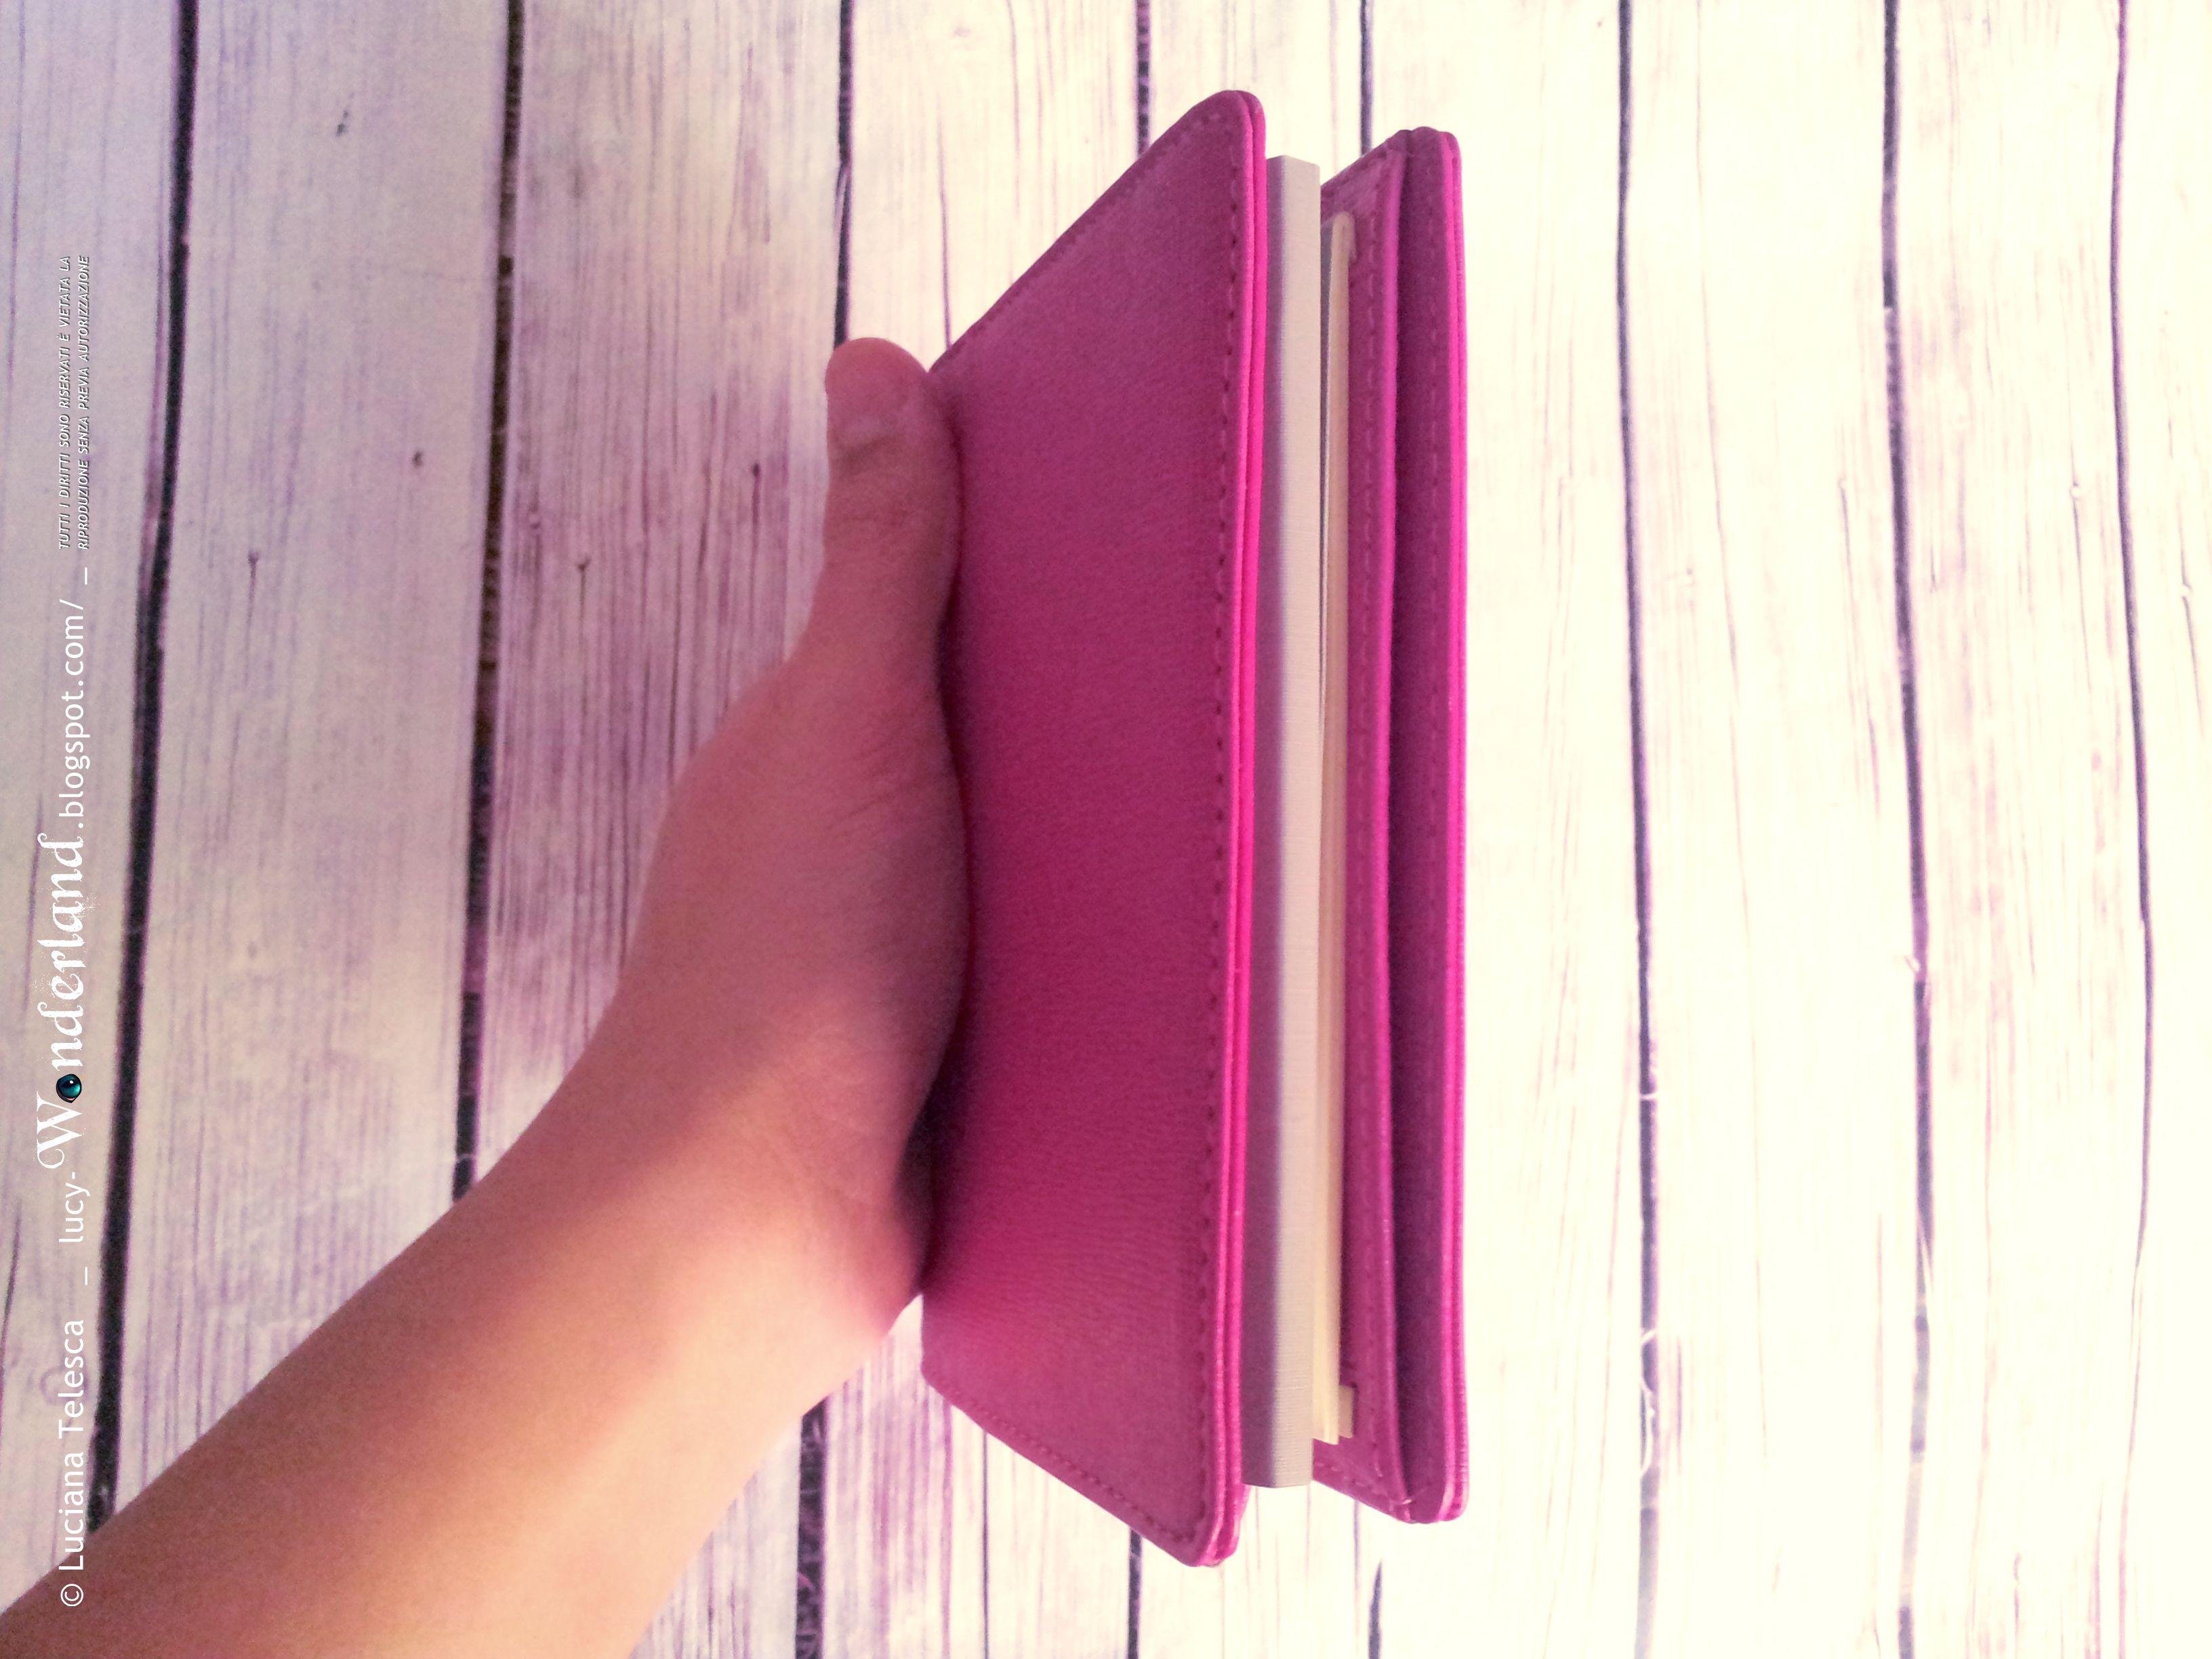 #filofaxflex #flex #filofax #notebook #flexdori